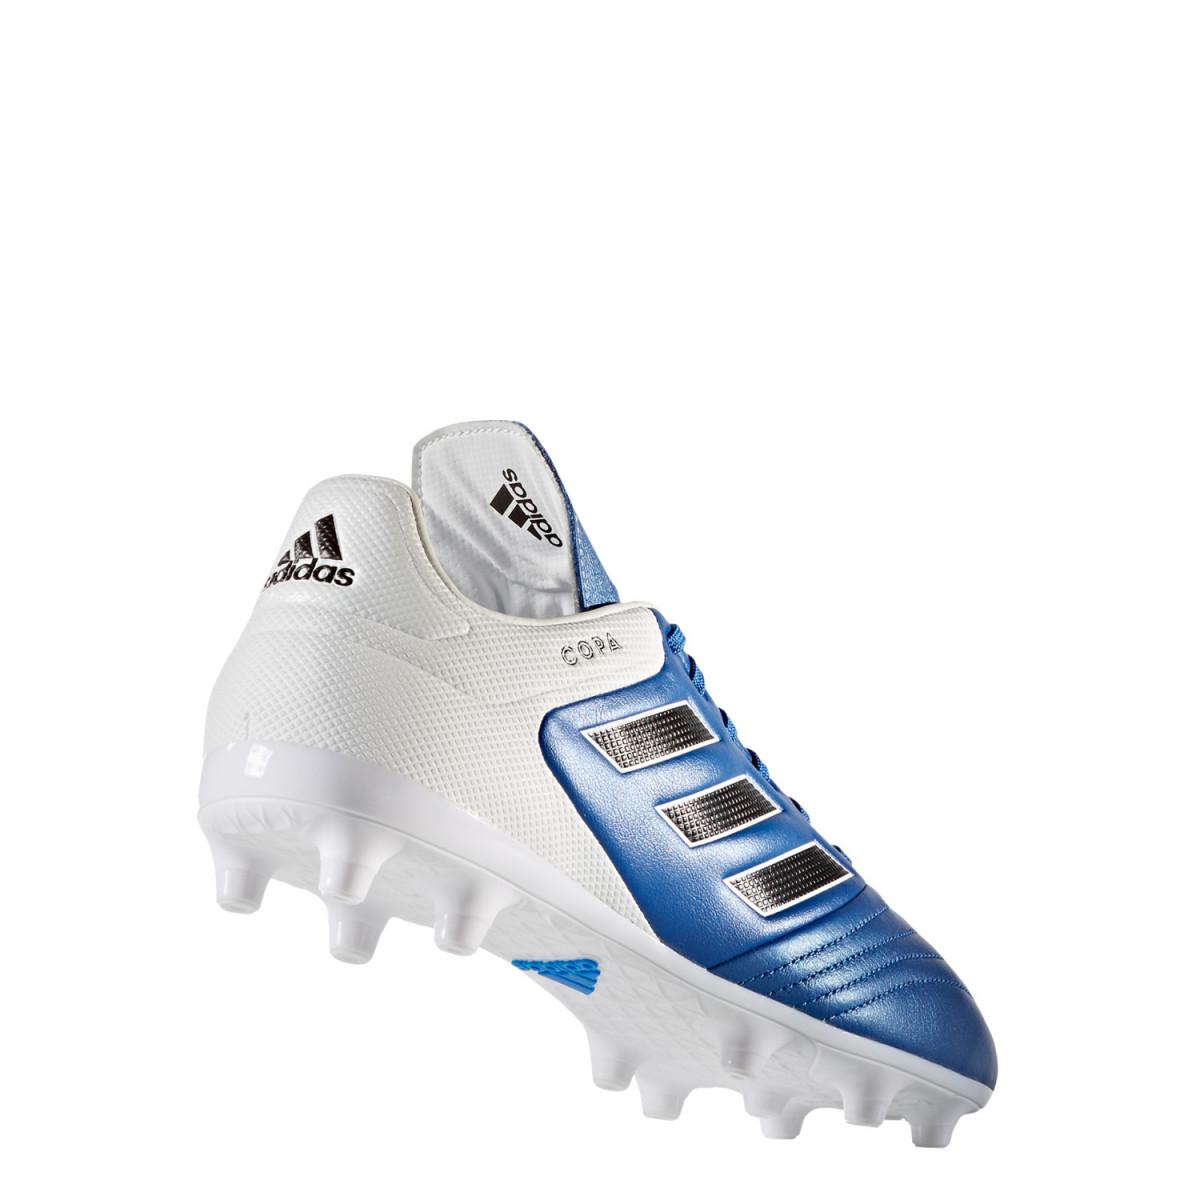 0bce36ff2 Botines Adidas Copa 17.3 Fg